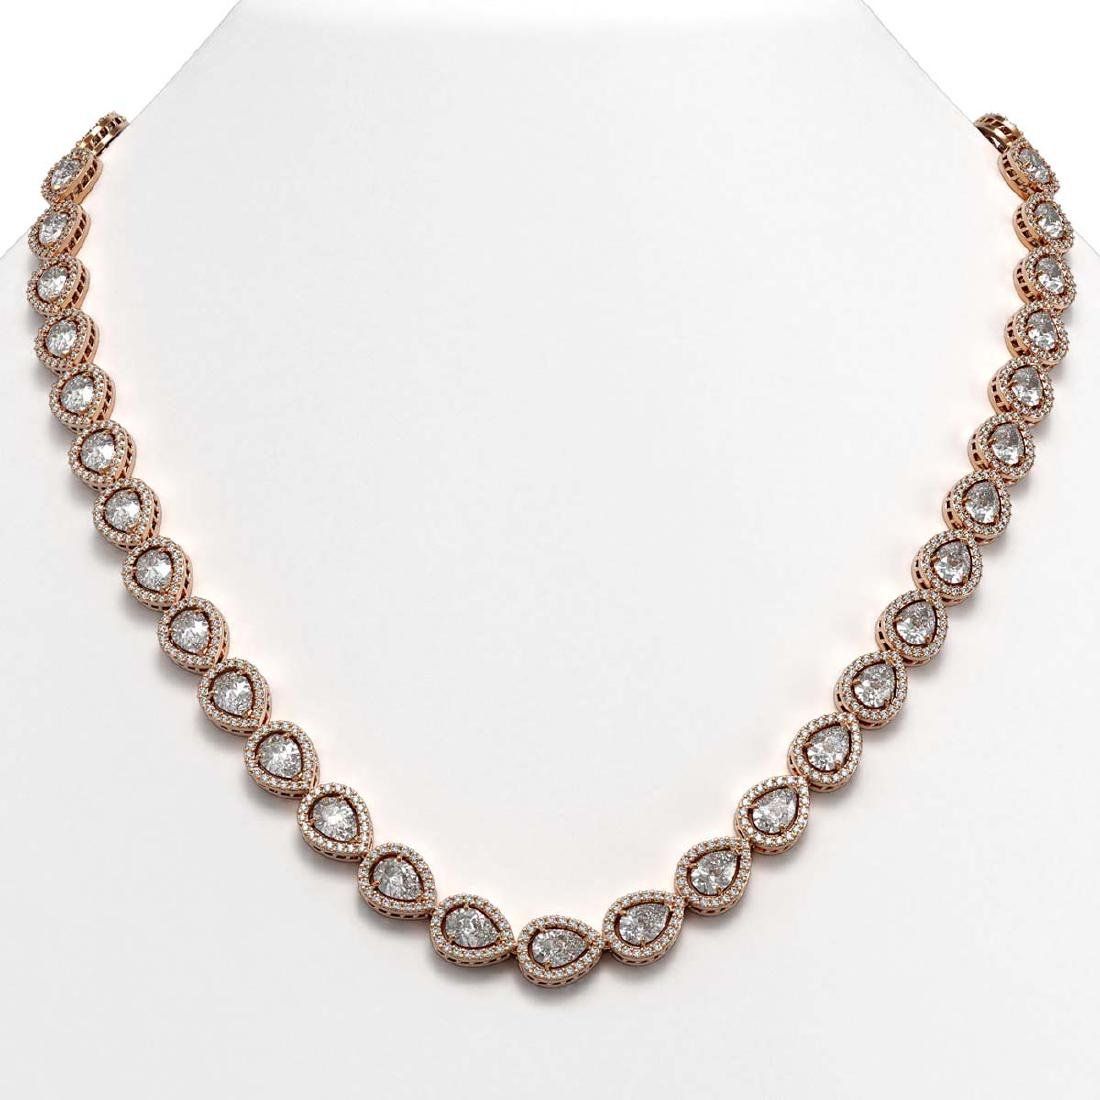 33.08 CTW Pear Diamond Designer Necklace 18K Rose Gold